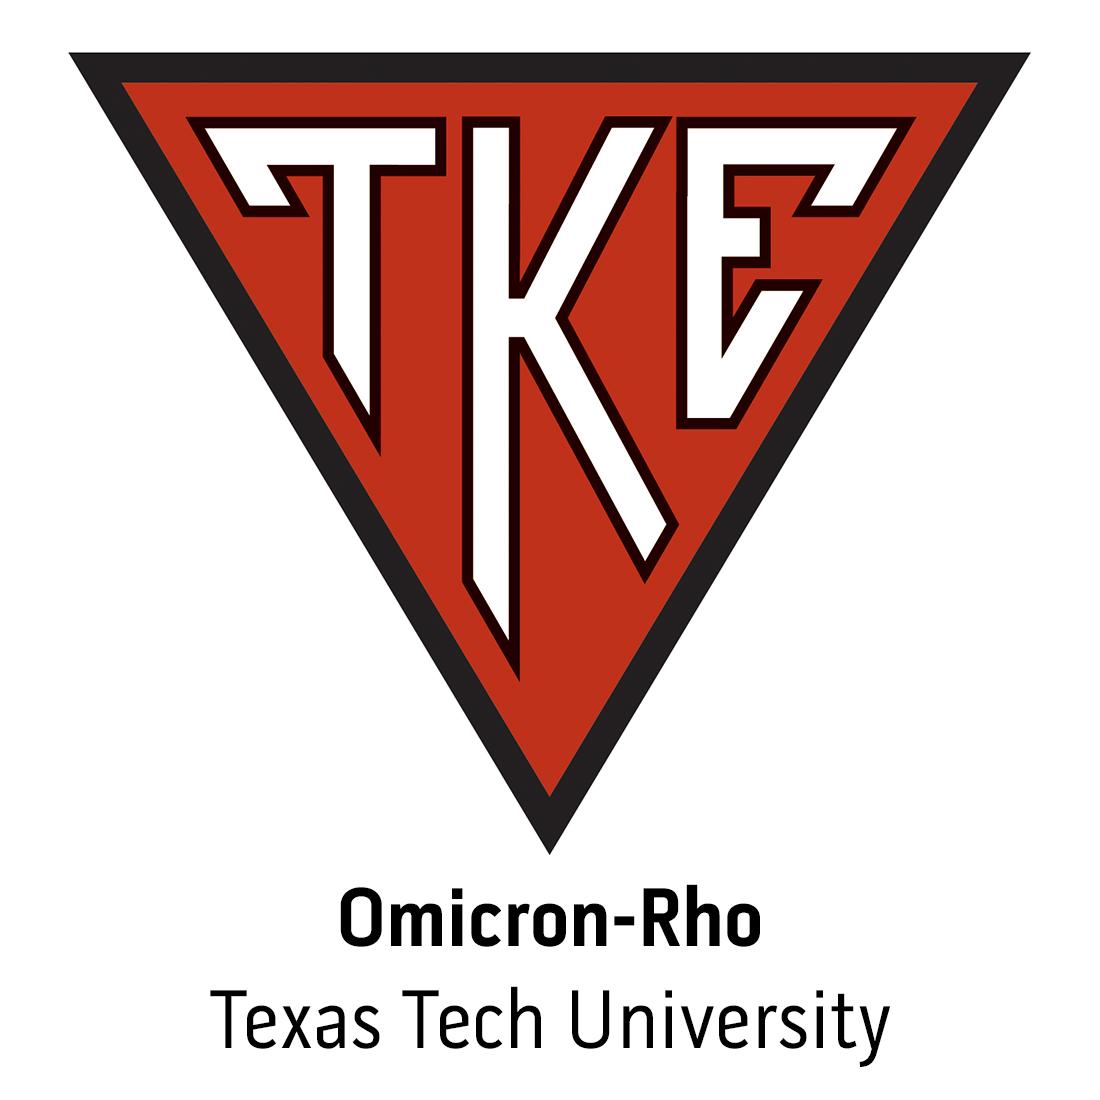 Omicron-Rho Chapter at Texas Tech University